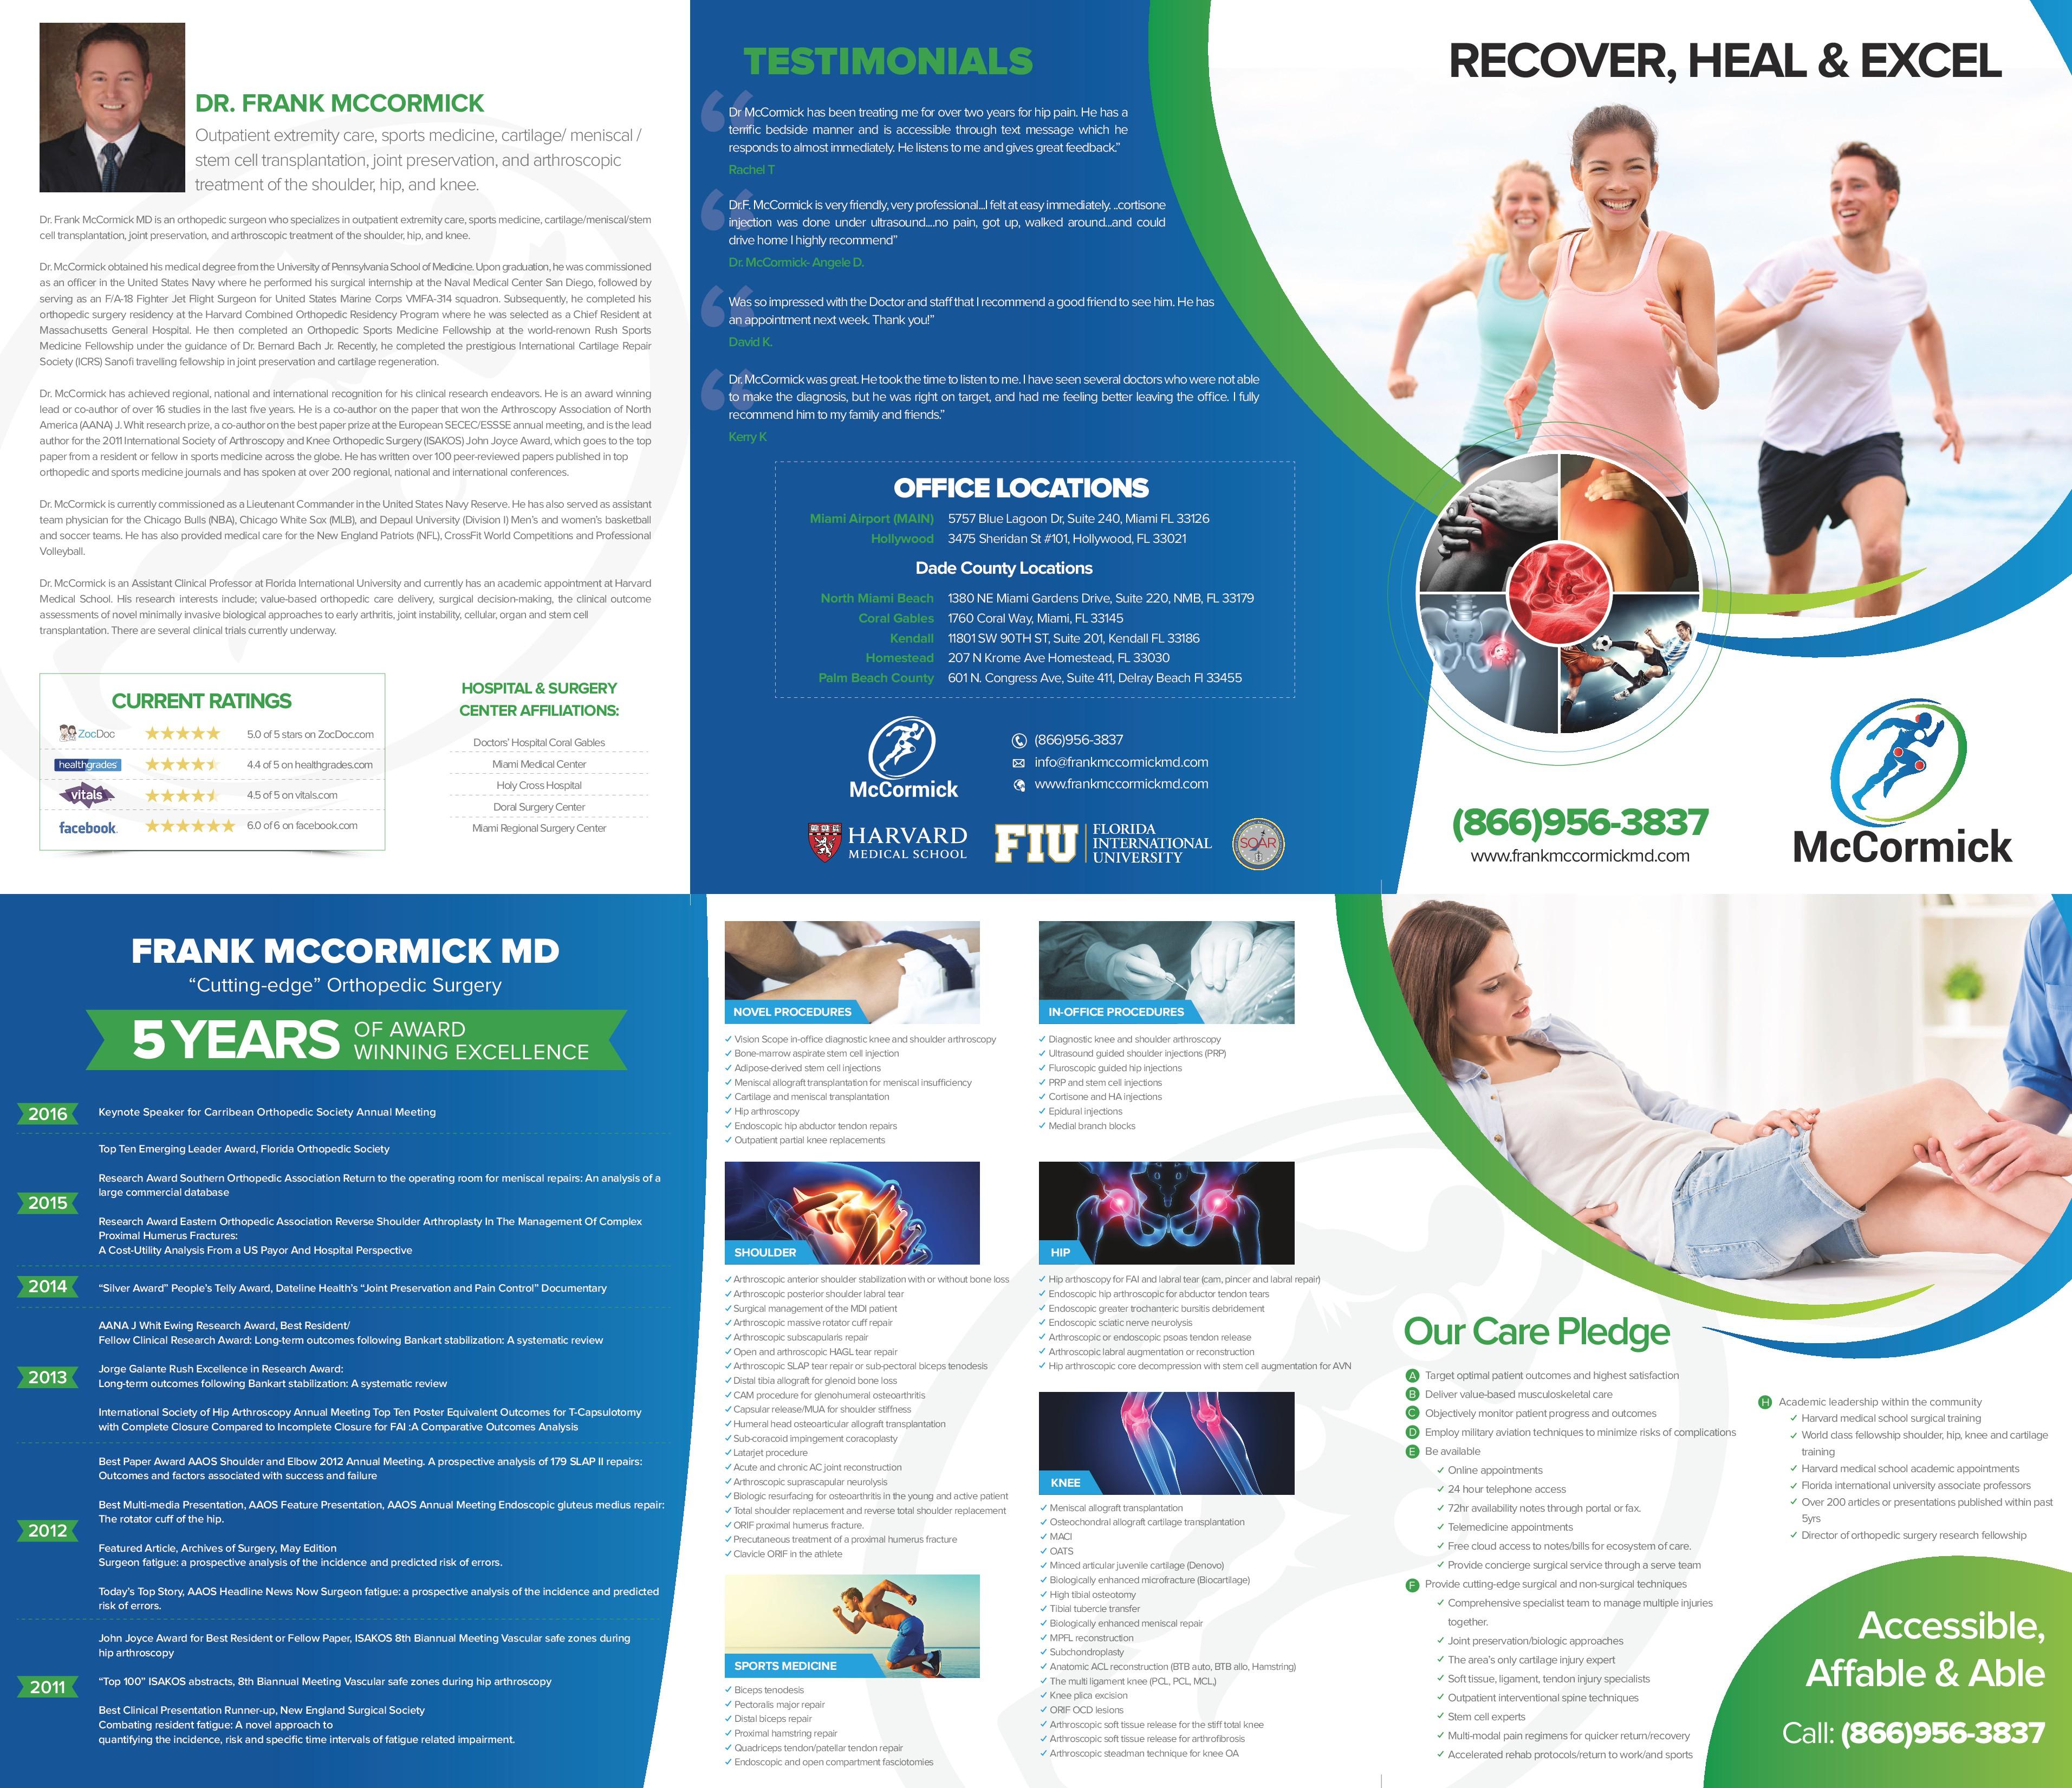 Marketing brochure for Dr. Frank McCormick